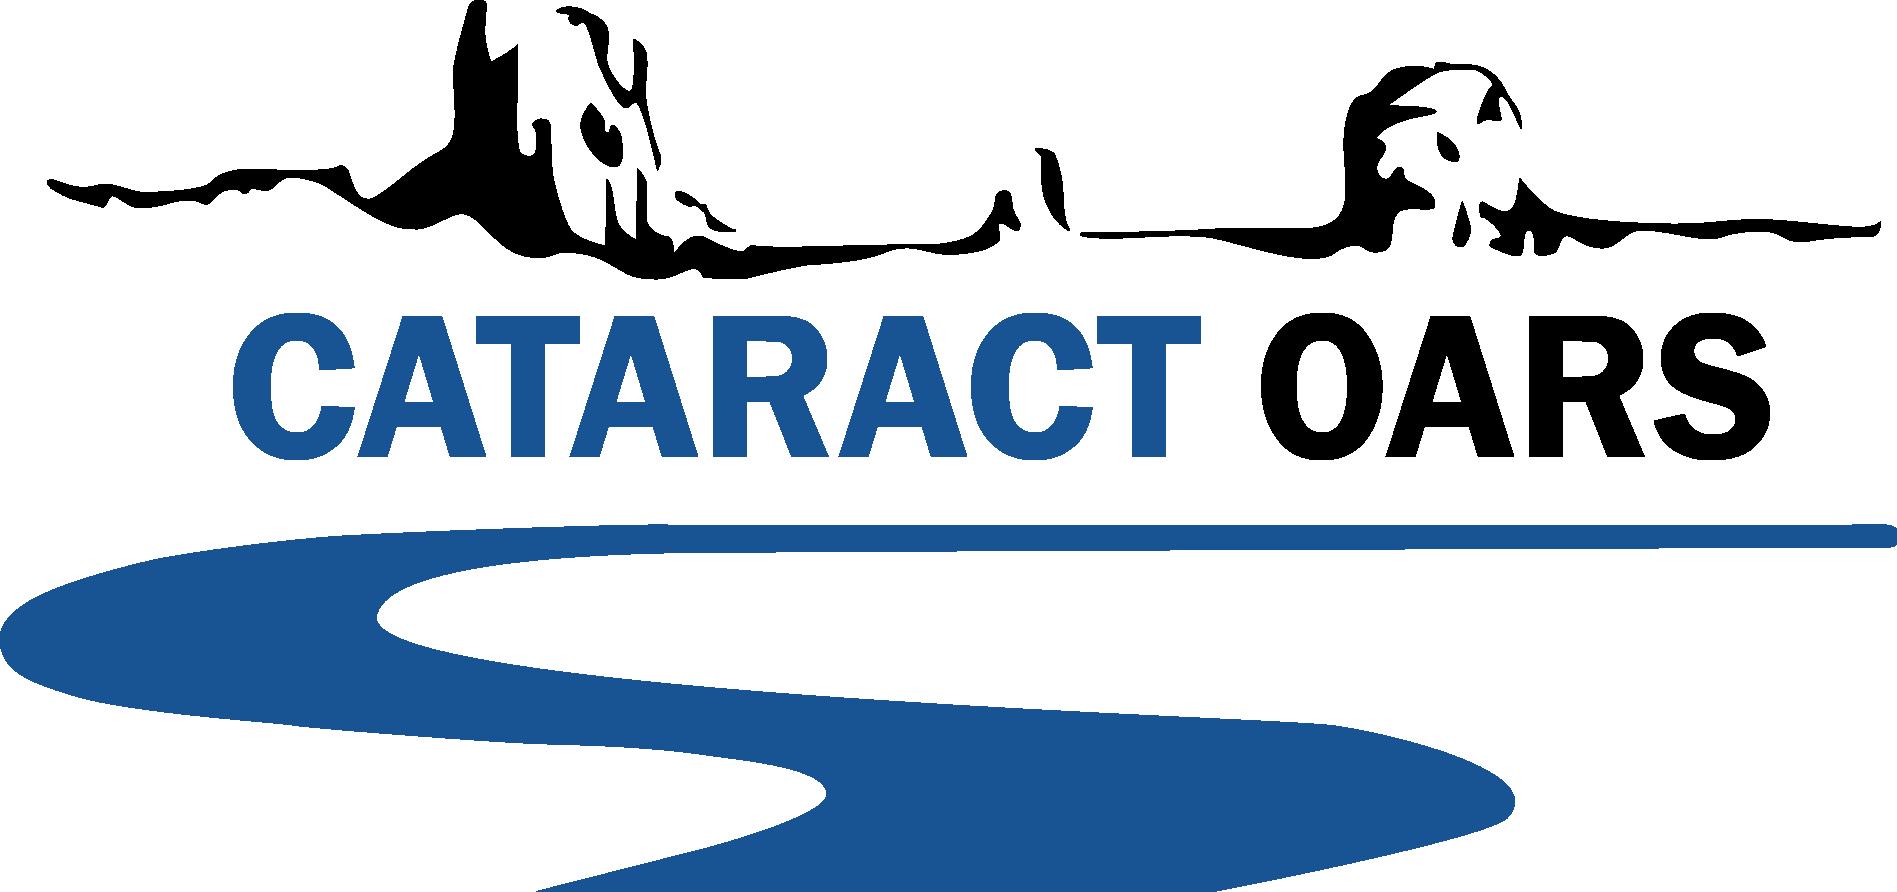 Cataract Oars - Final.png